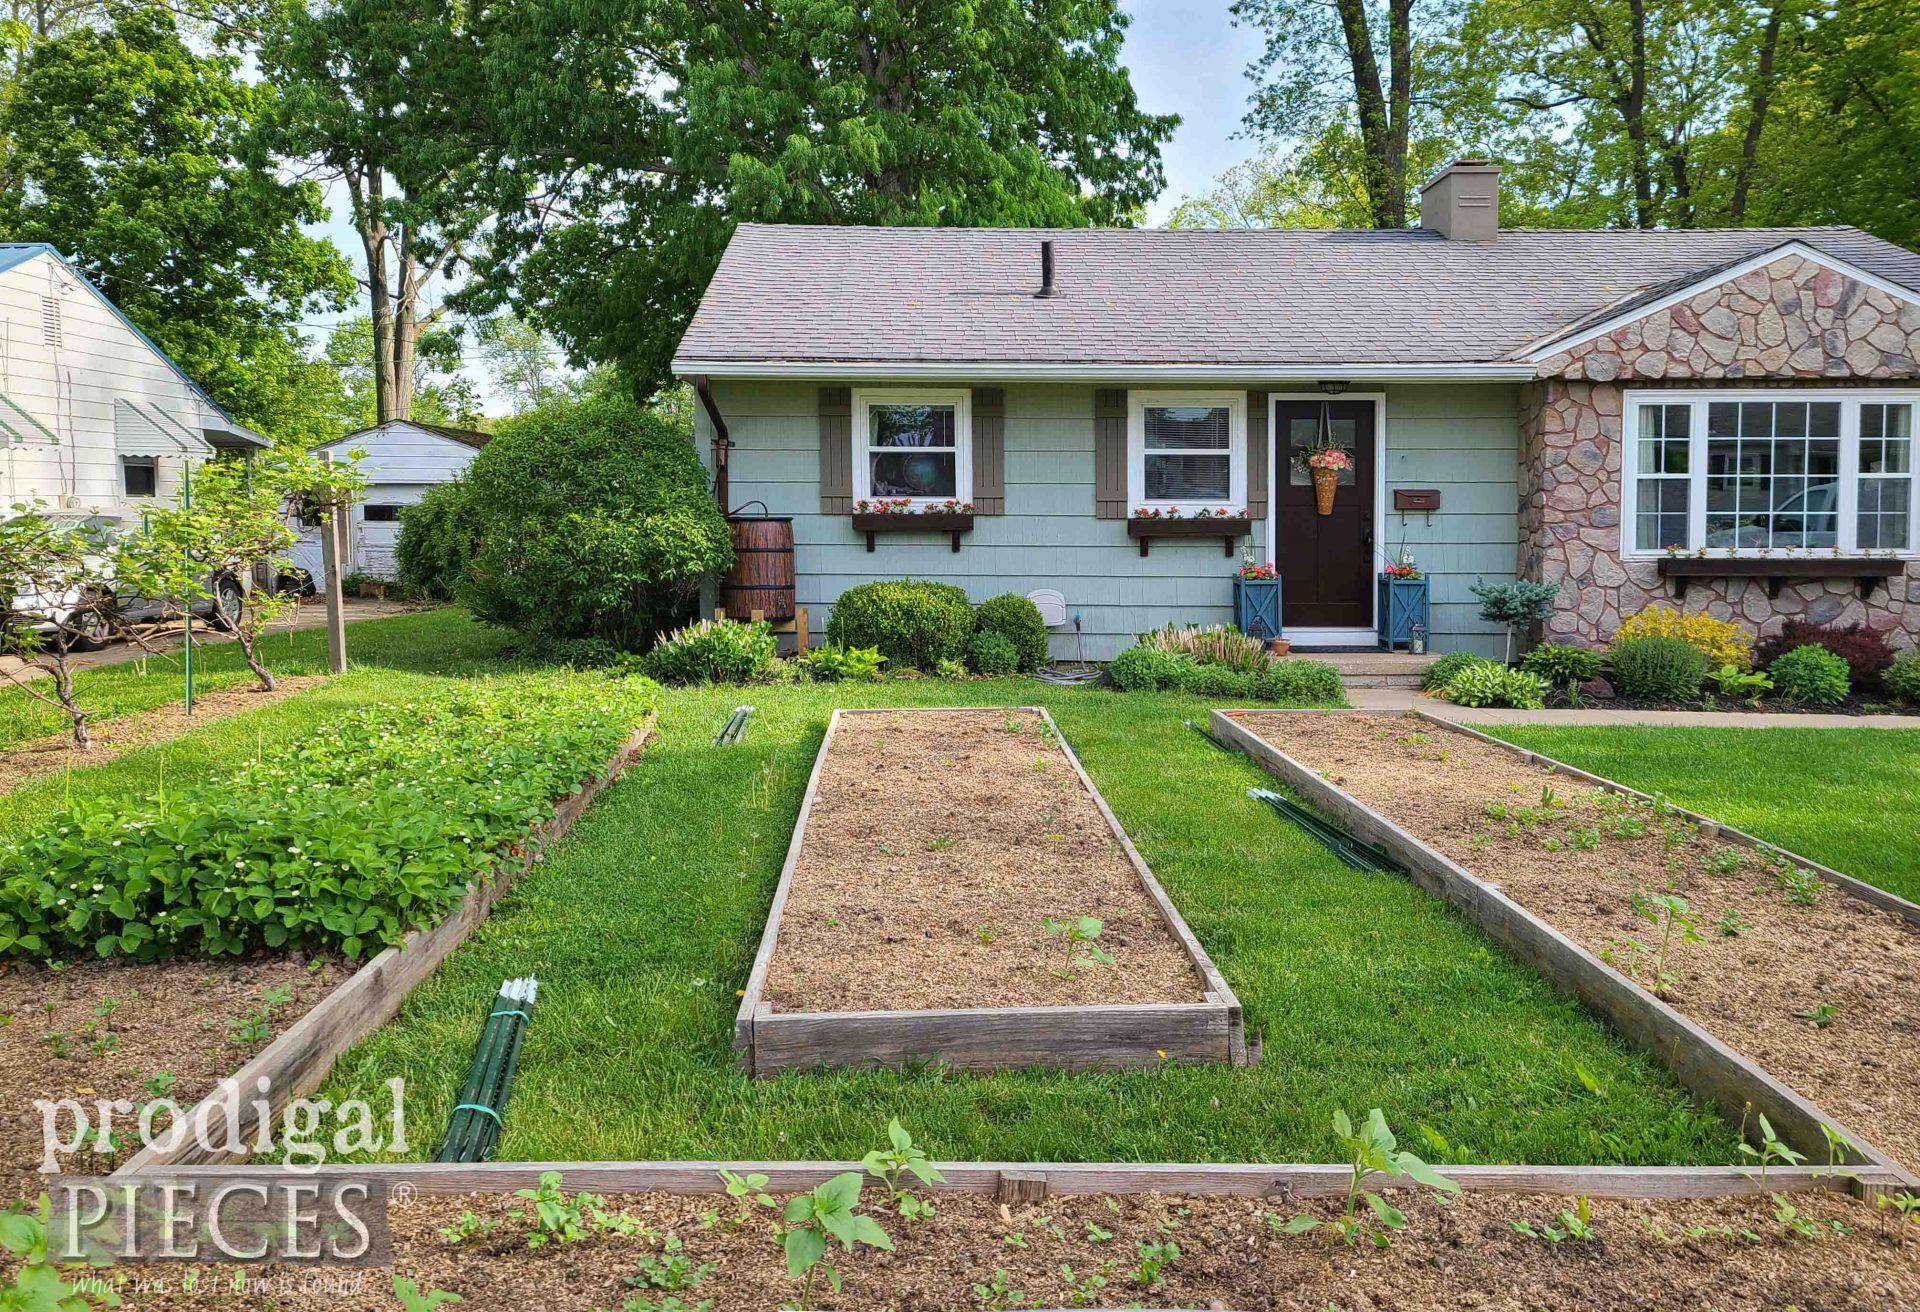 City Raised Garden Bed DIY Style by Larissa of Prodigal Pieces | prodigalpieces.com #prodigalpieces #garden #home